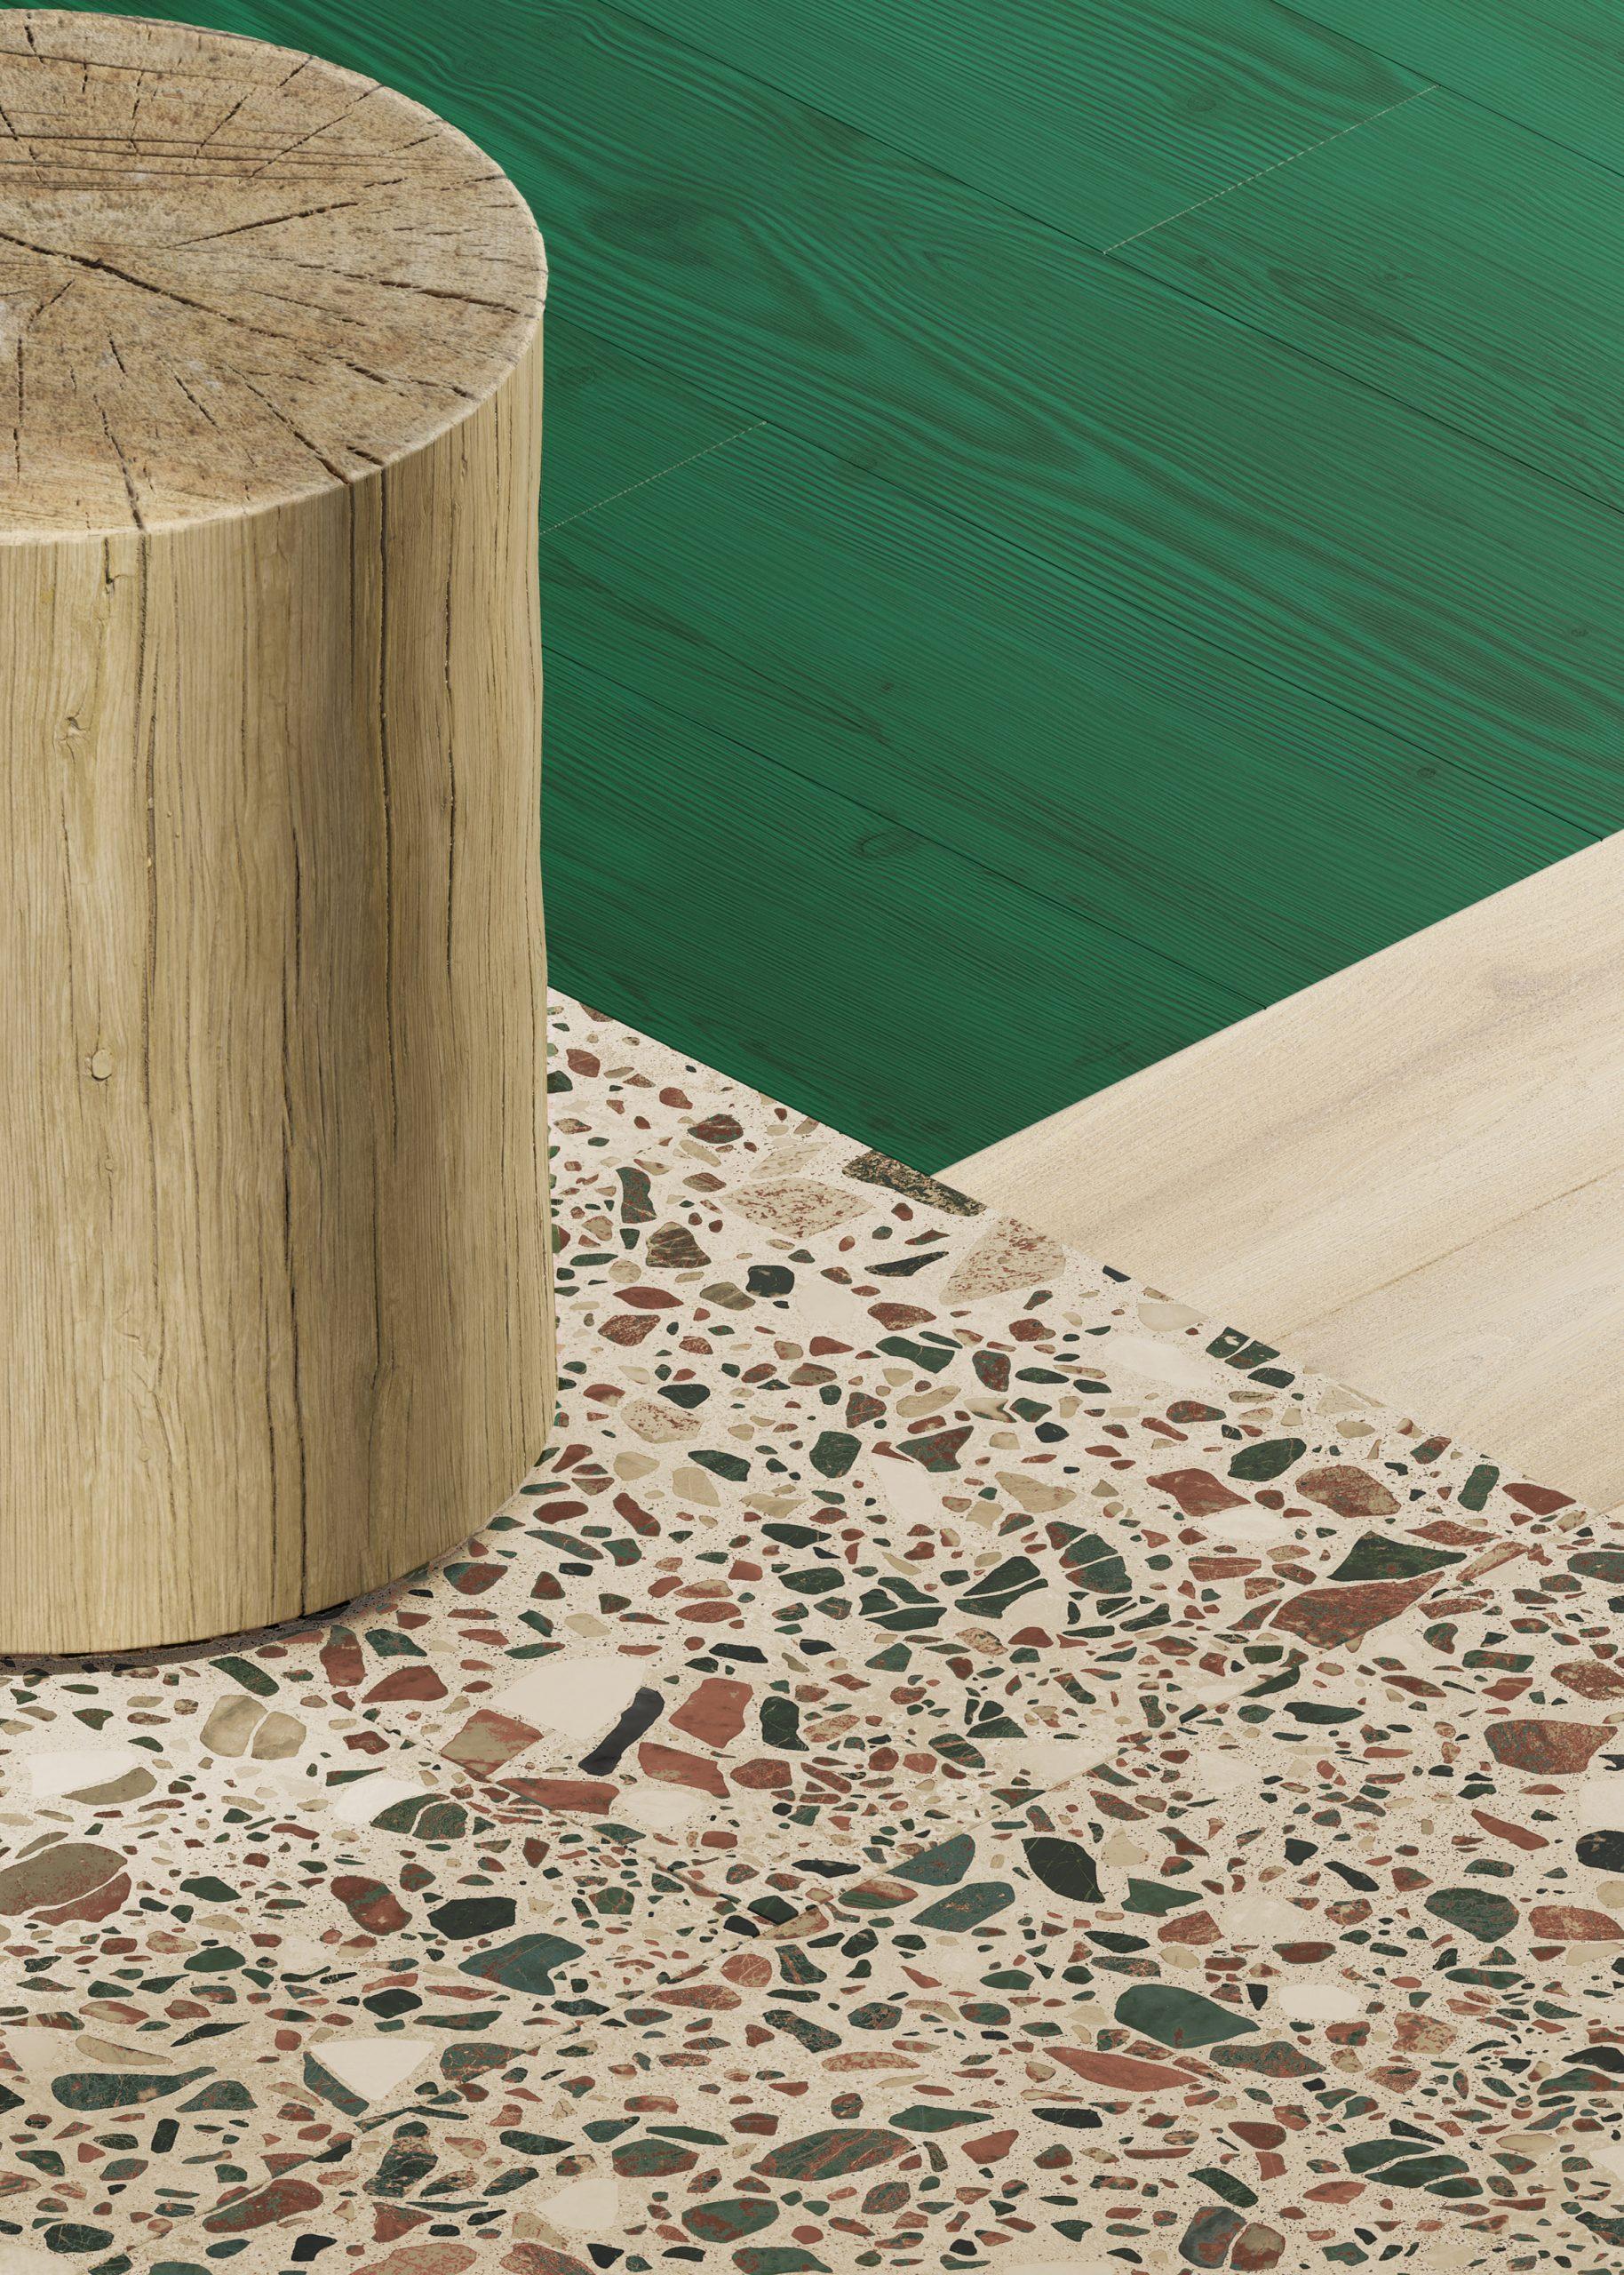 Wood- and terrazzo-like vinyl flooring